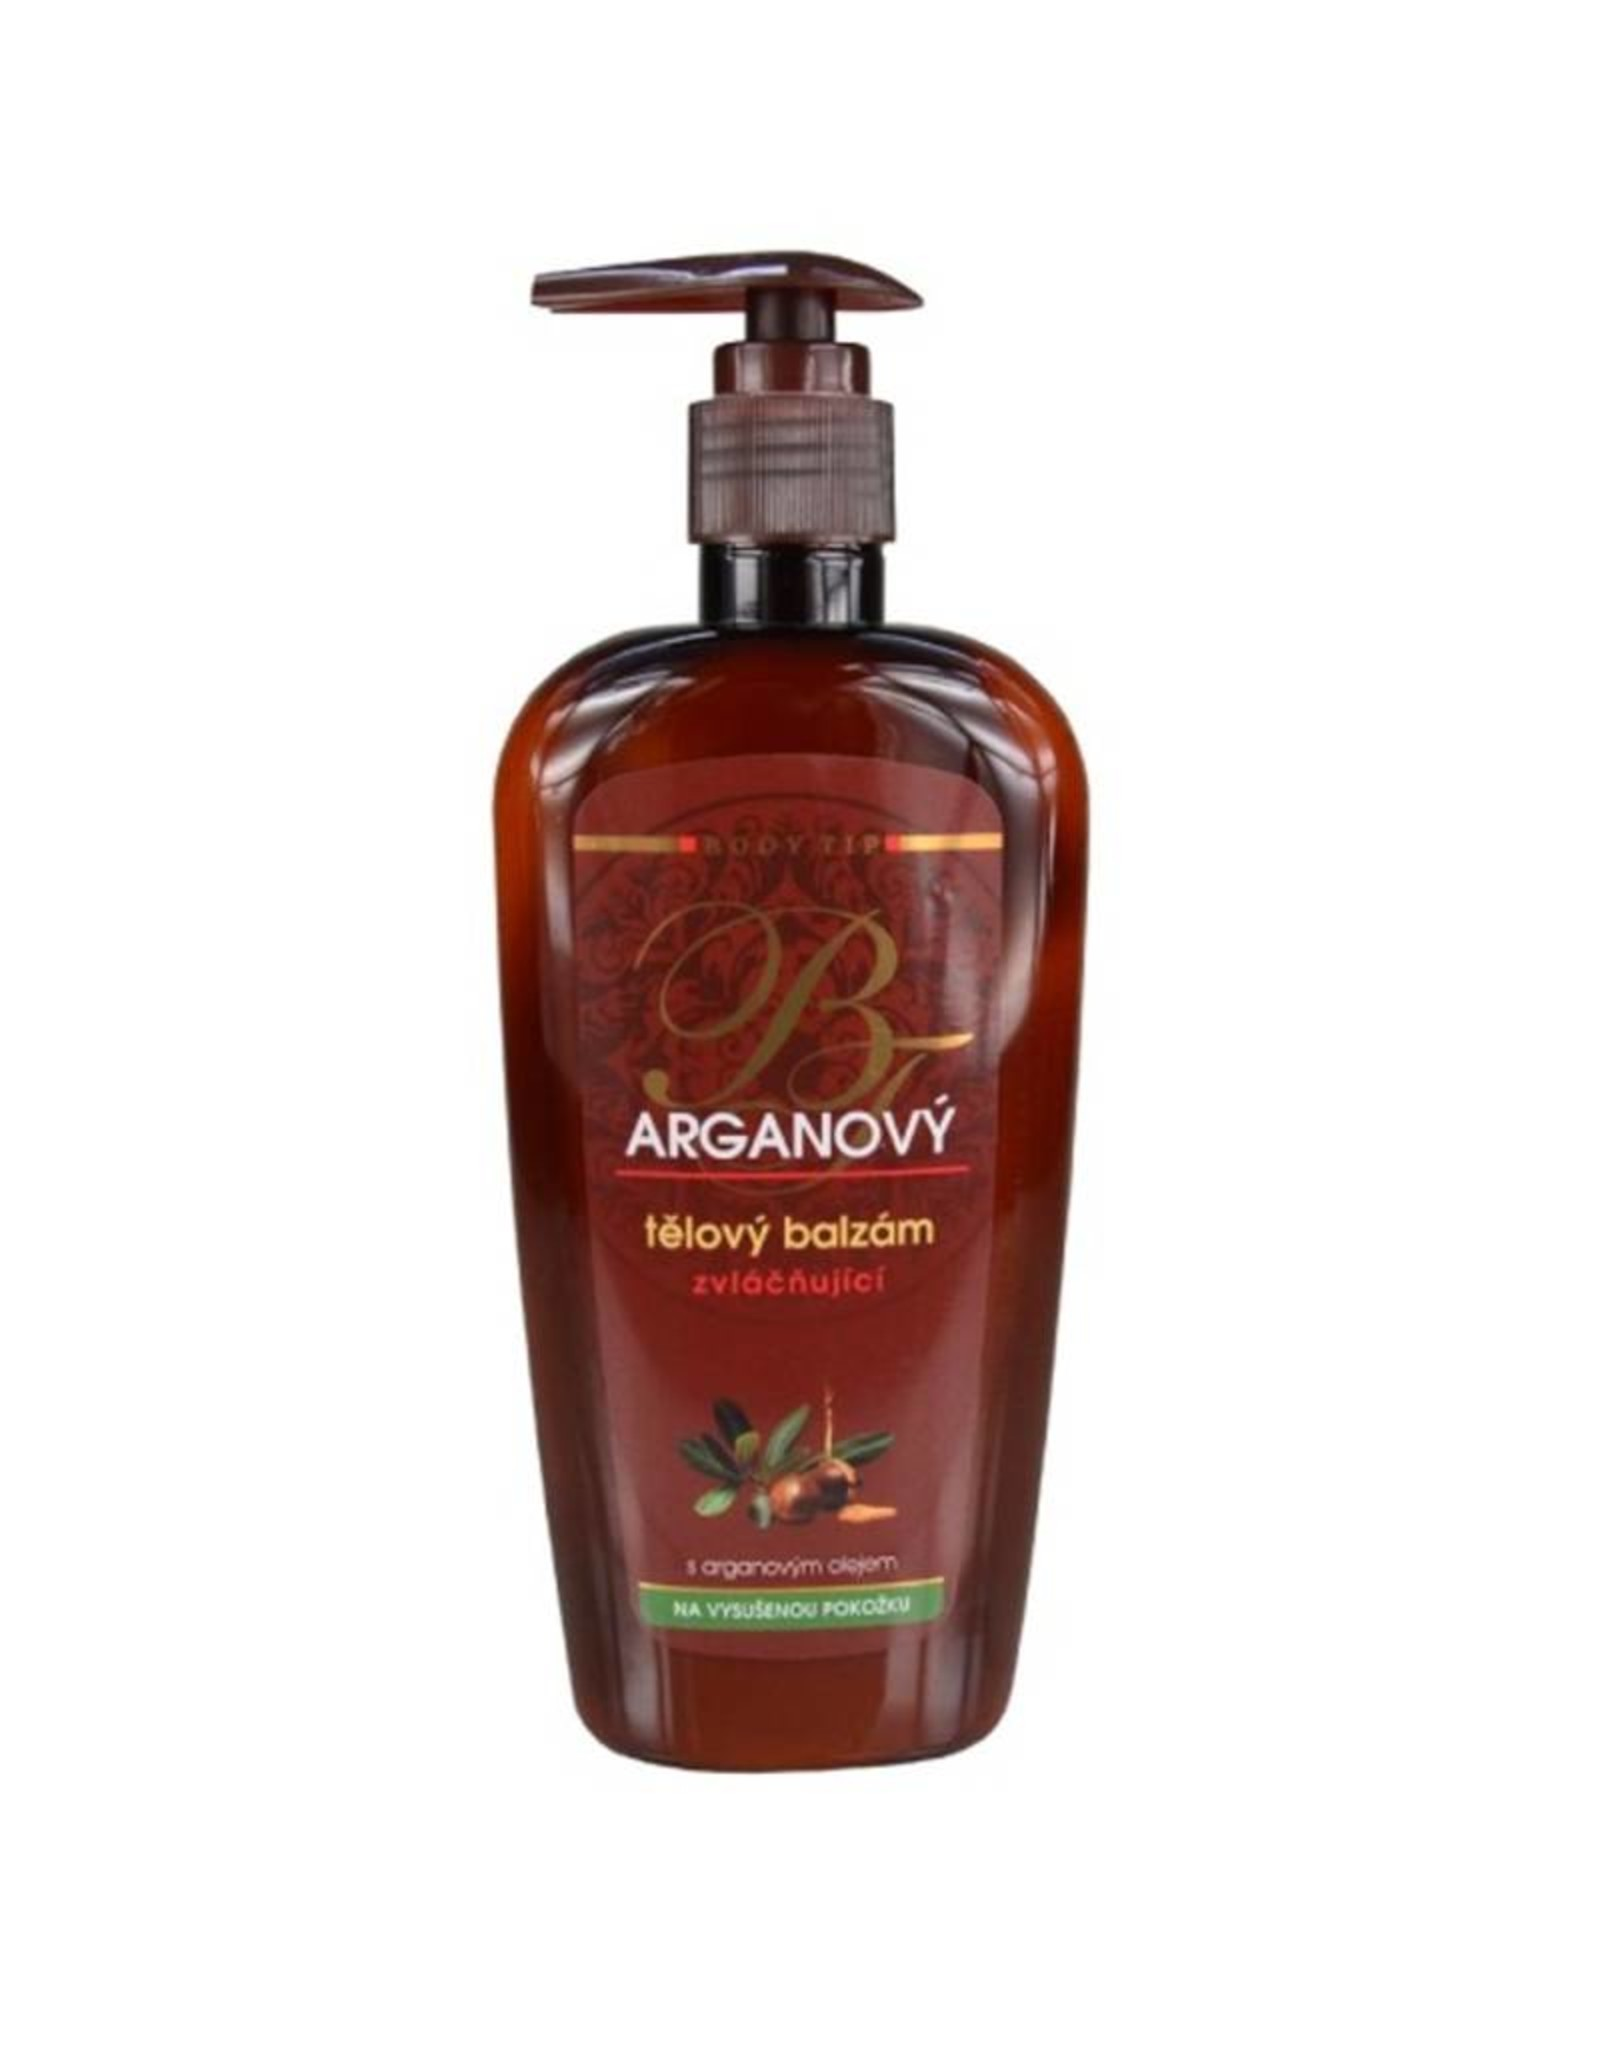 BODY TIP Intensieve Bodylotion met Arganolie